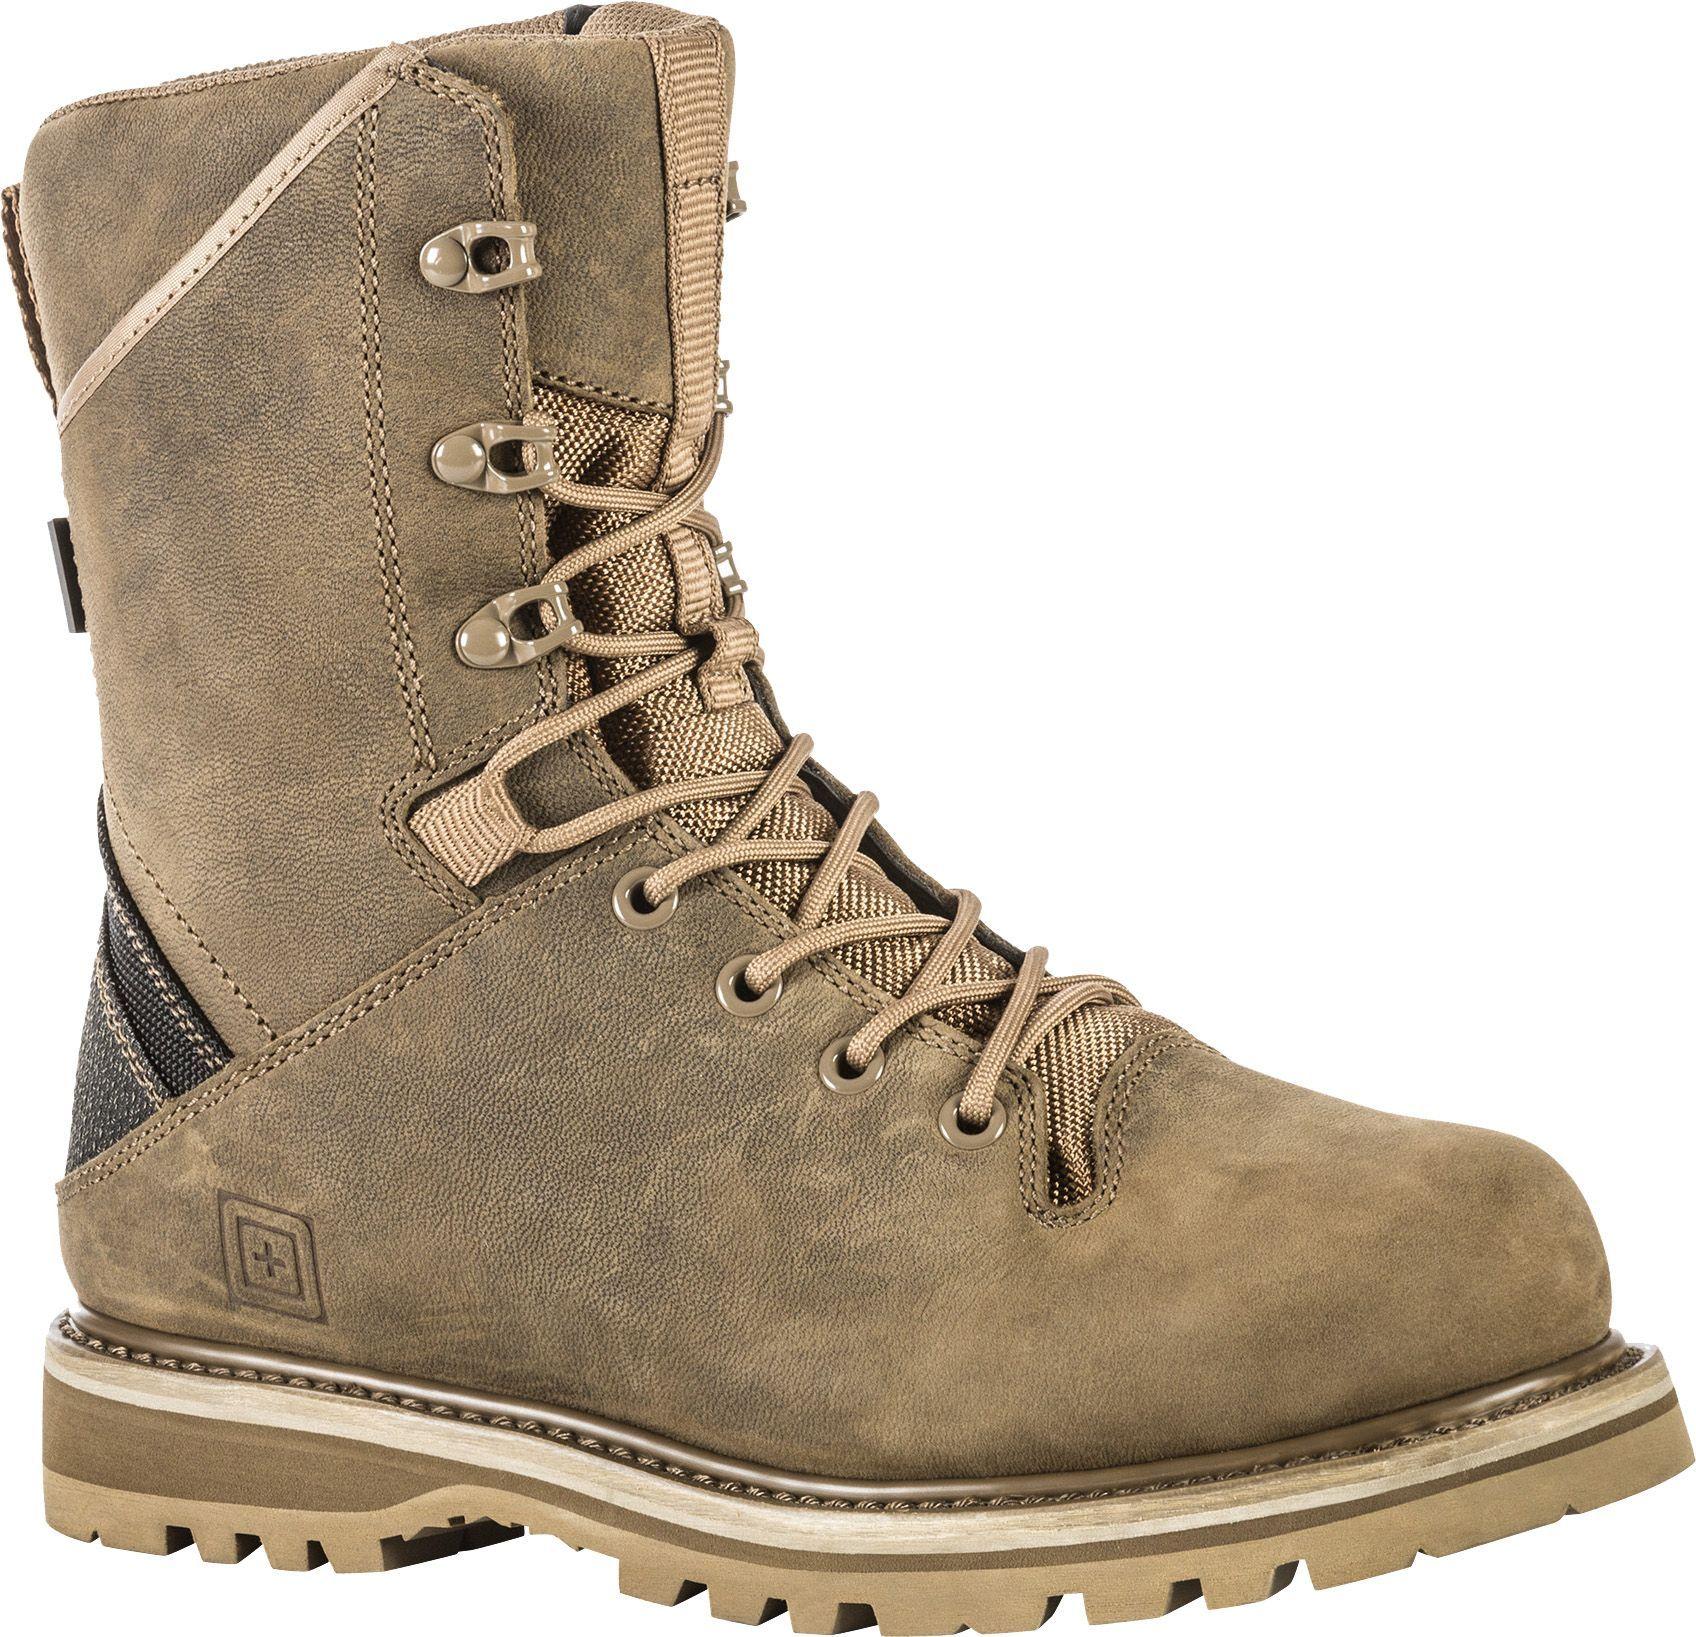 5 11 Tactical Men S Apex 8 Waterproof Tactical Boots Boots Nylons Heels Tactical Clothing